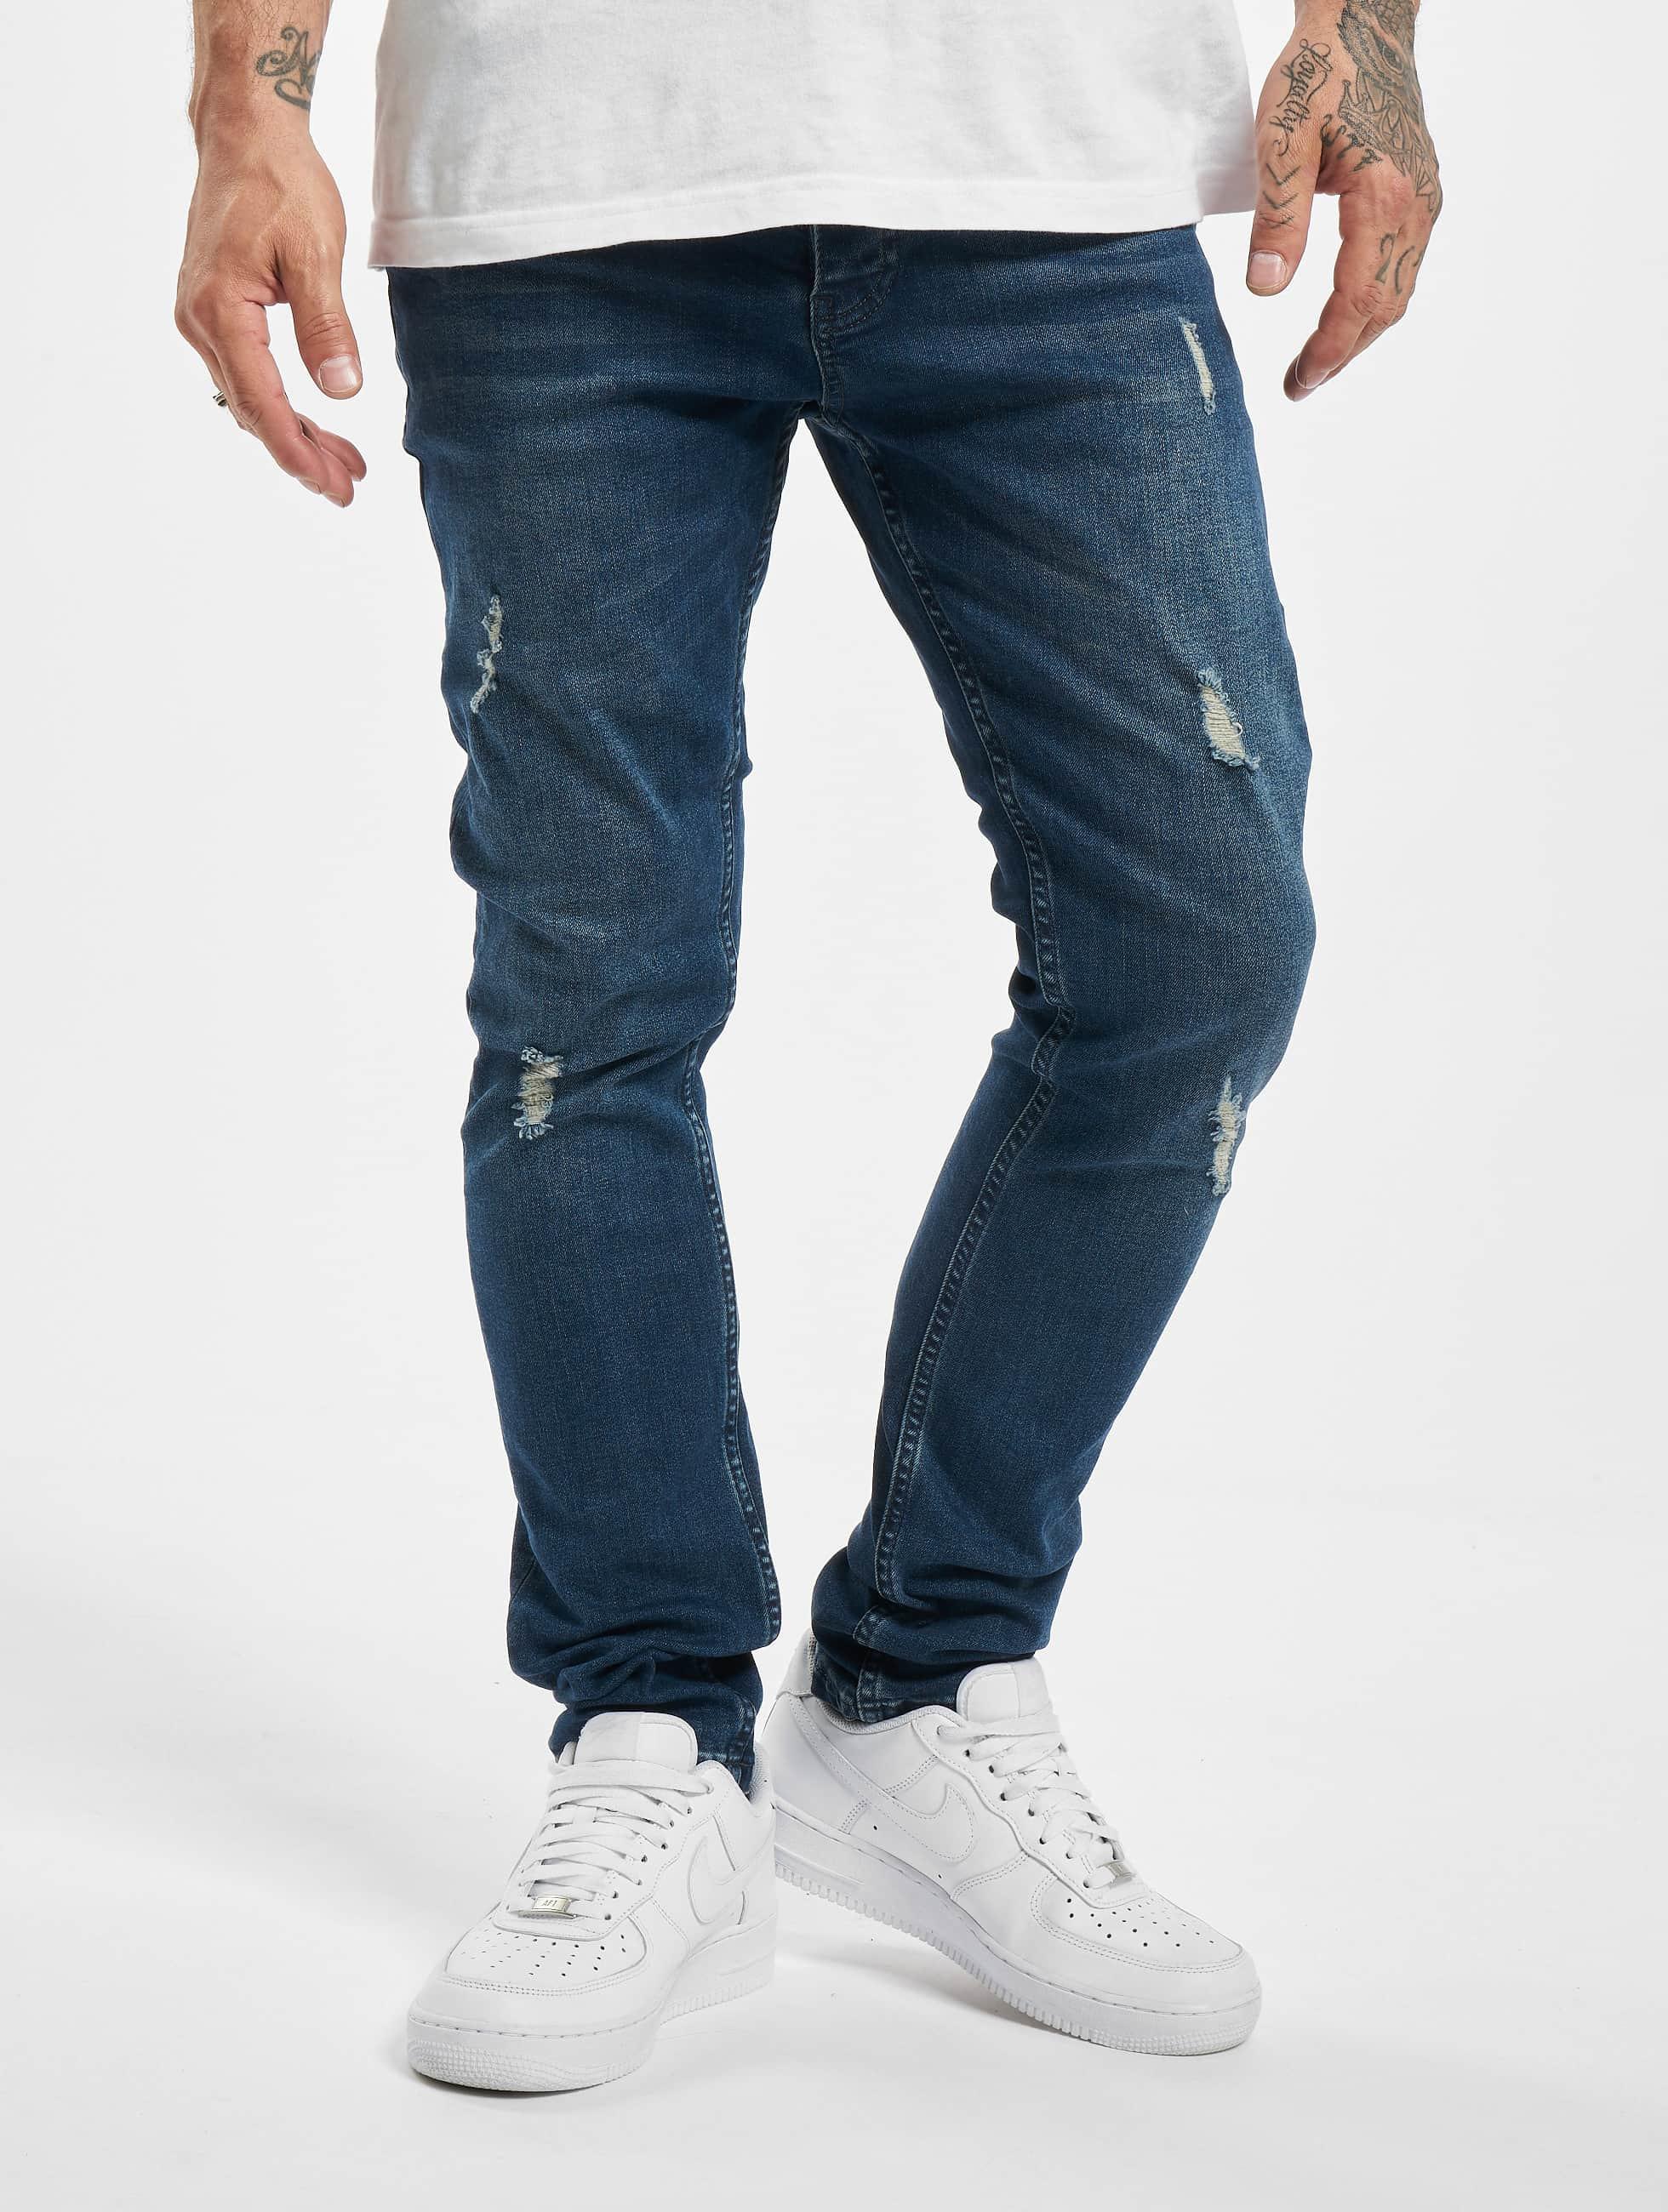 DEF / Slim Fit Jeans Hoxla in blue W 33 L 32